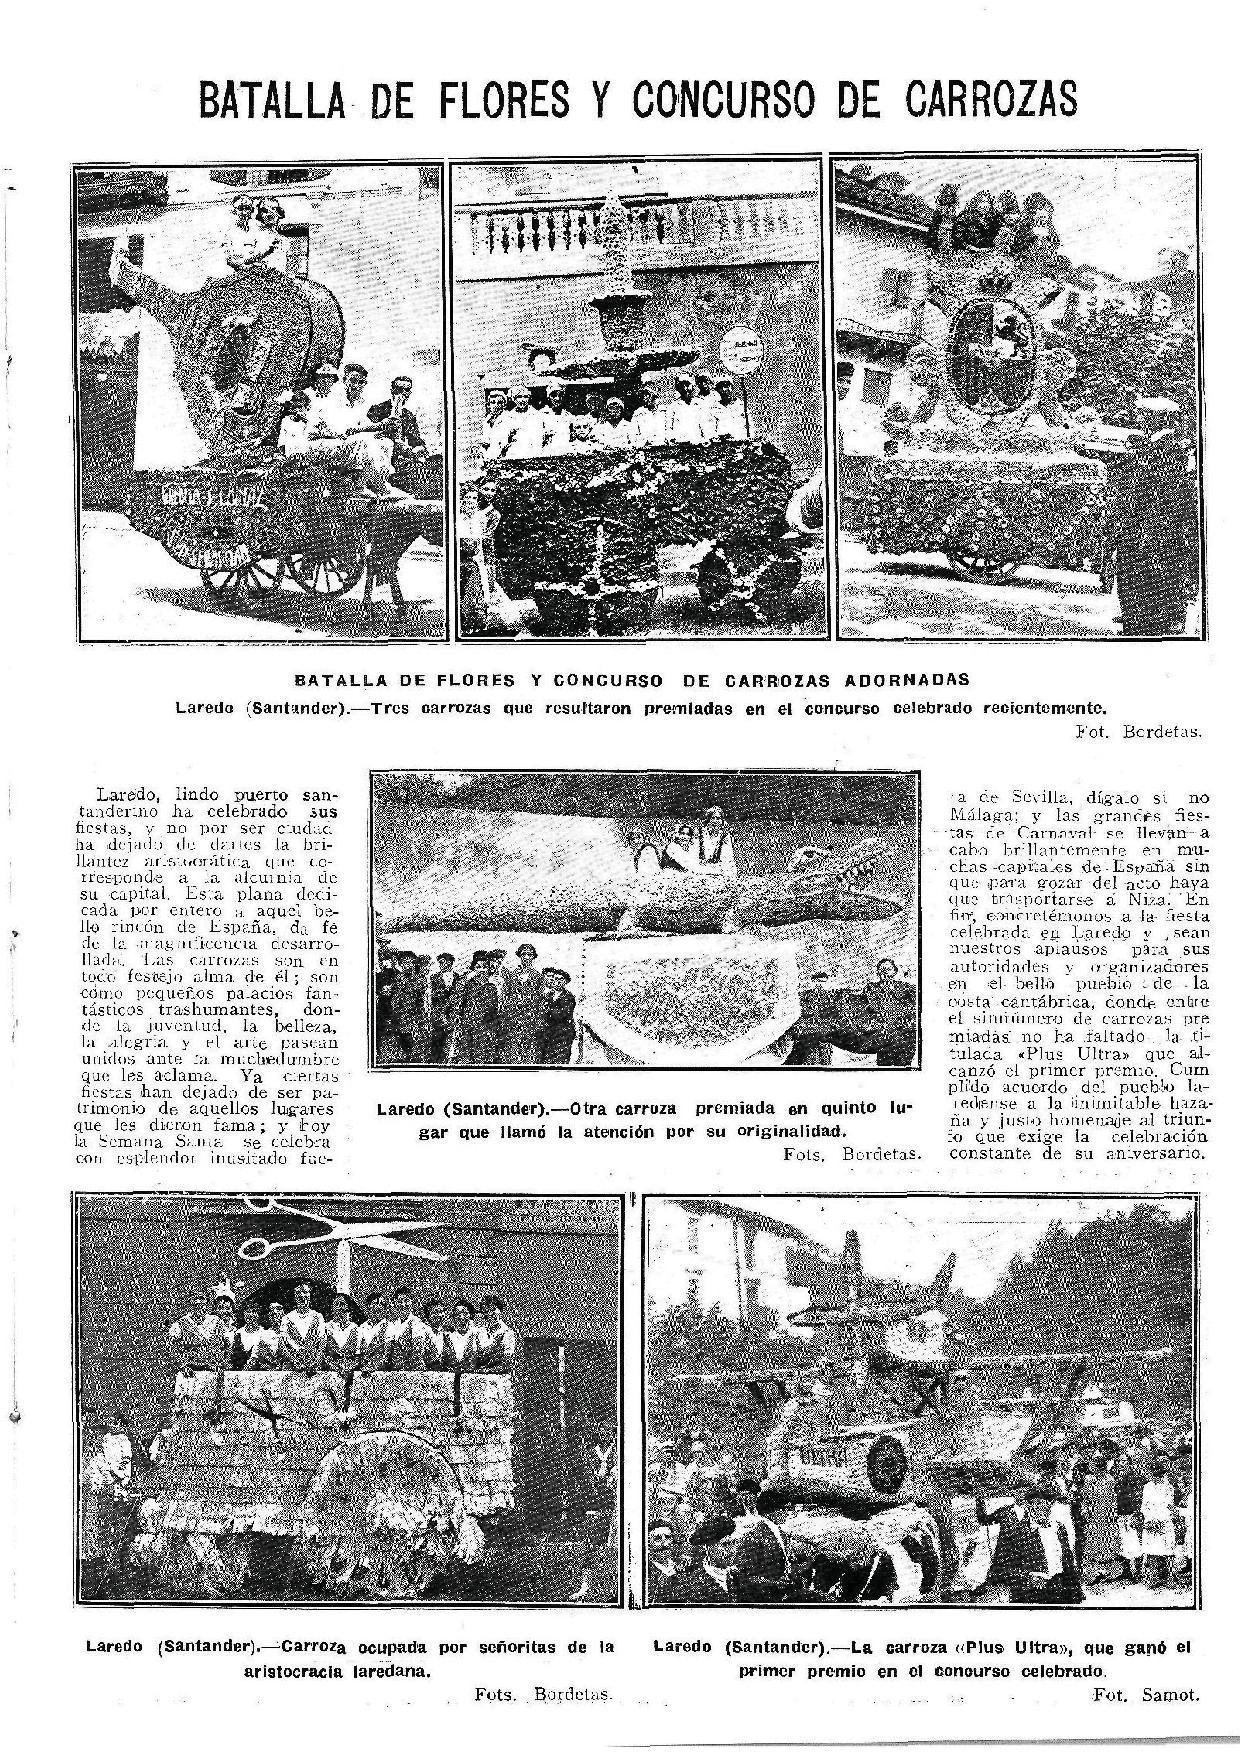 La Unión Ilustrada 17/09/1926